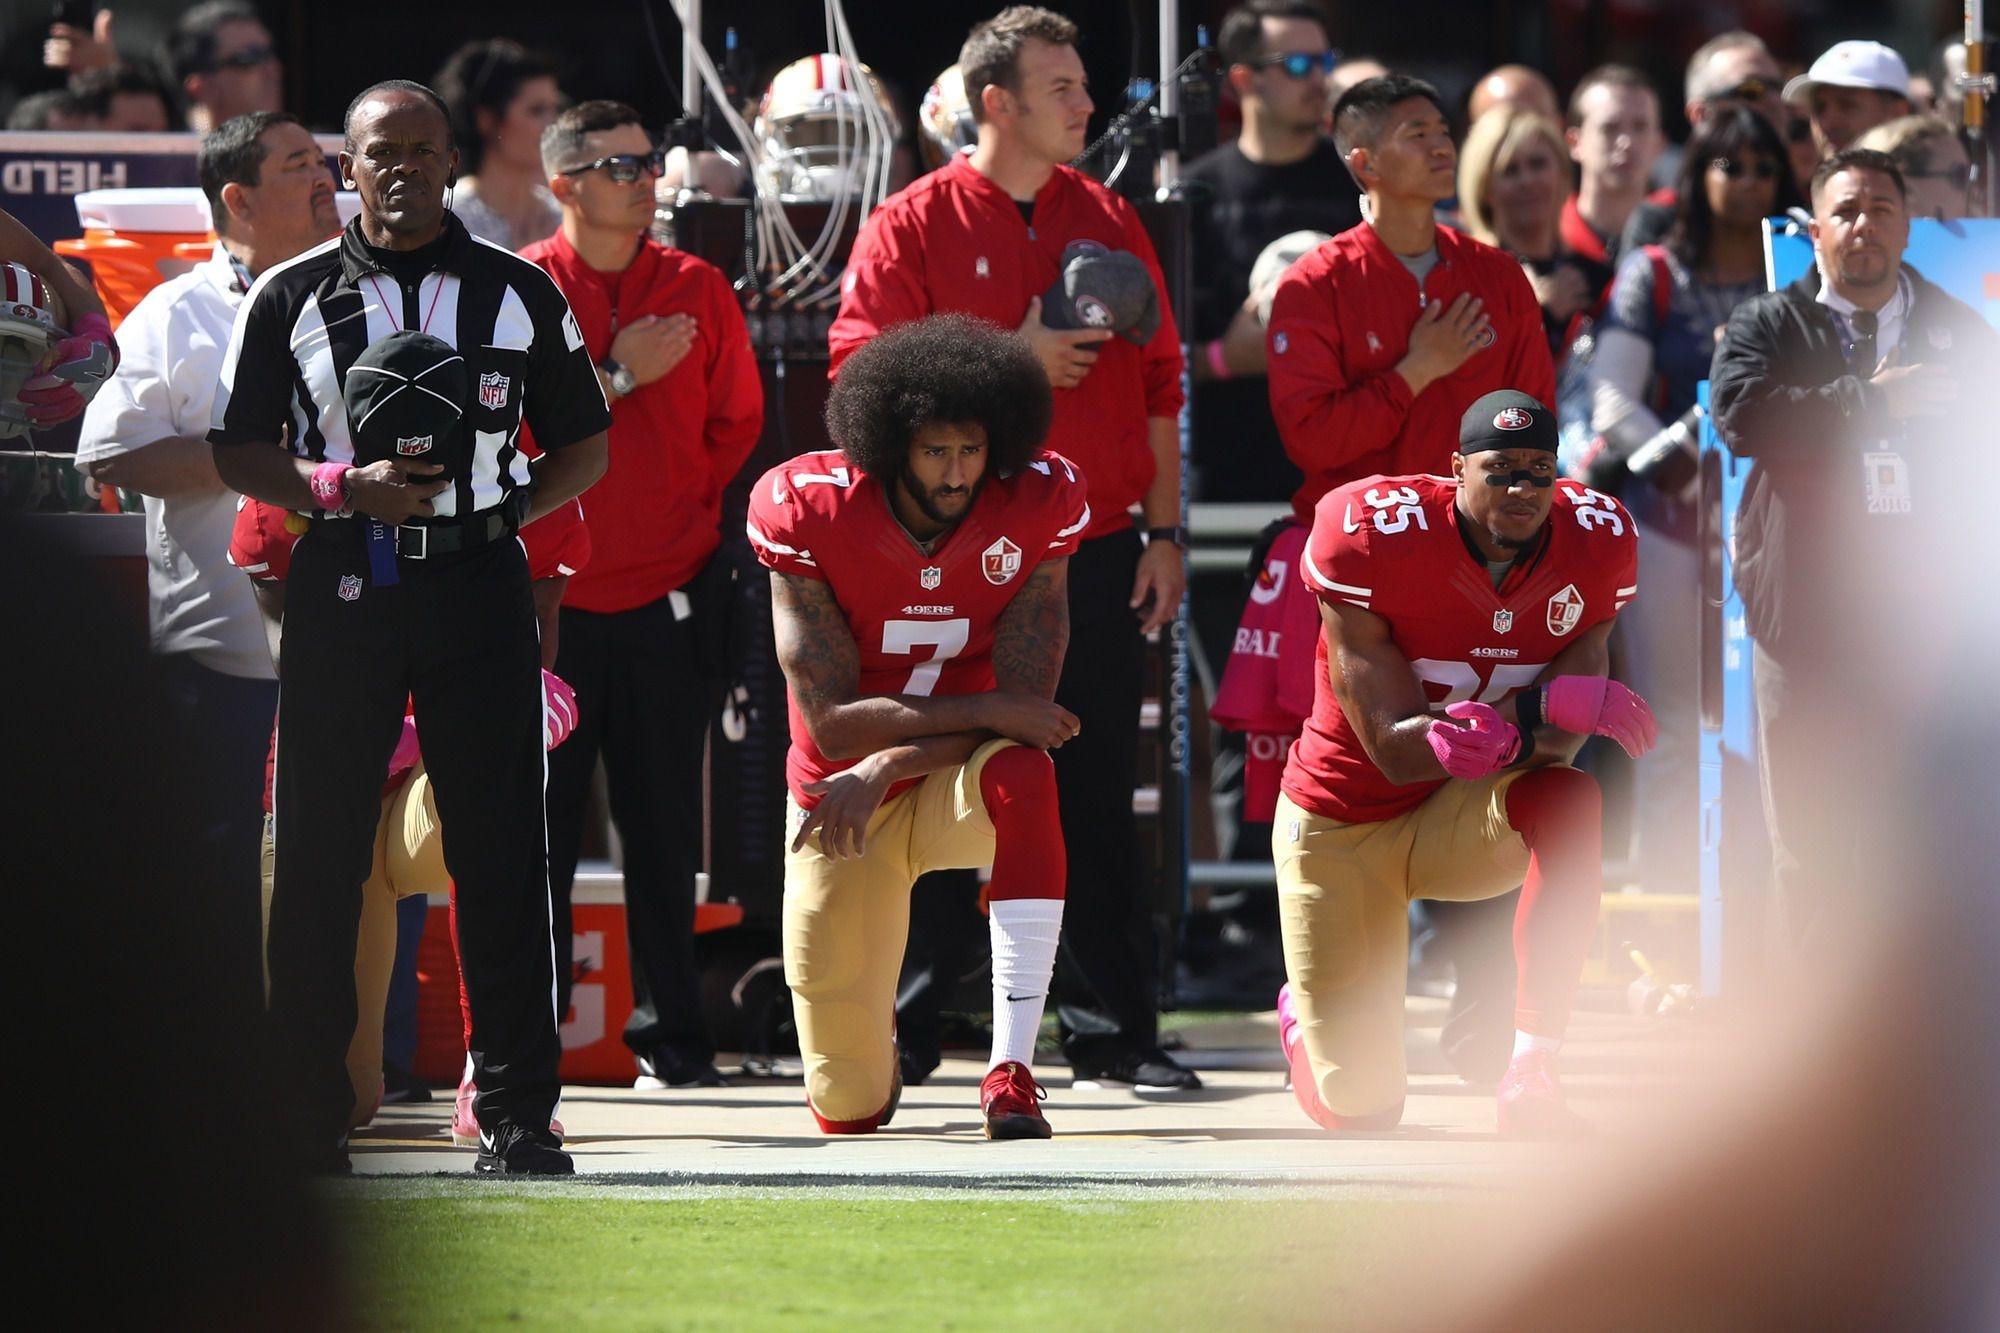 Eric Reid #35 et Colin Kaepernick #7 durant l'hymne national américain., AFP